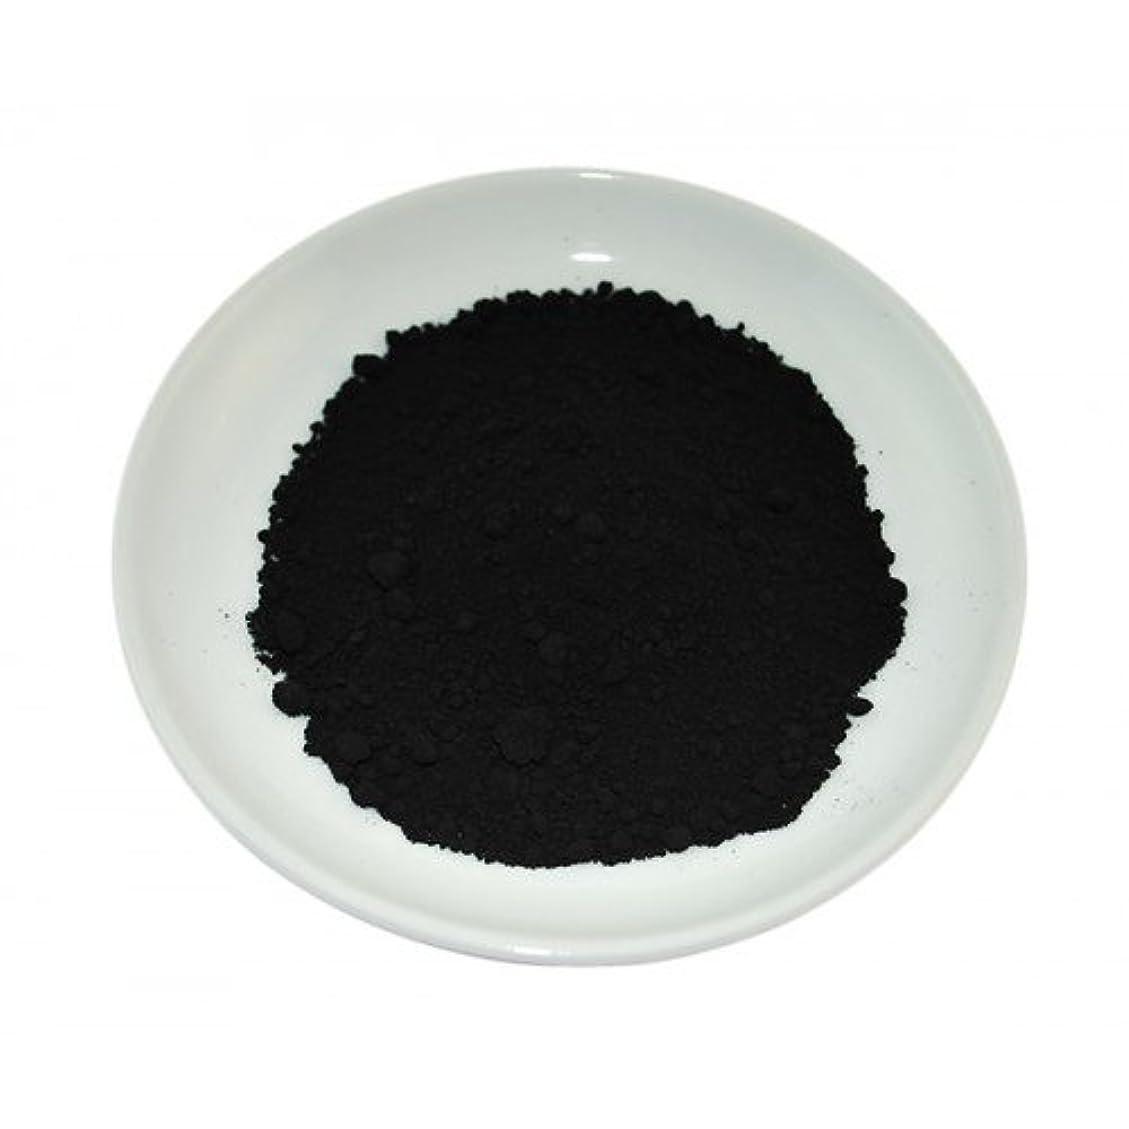 Black Oxide Mineral Powder 25g